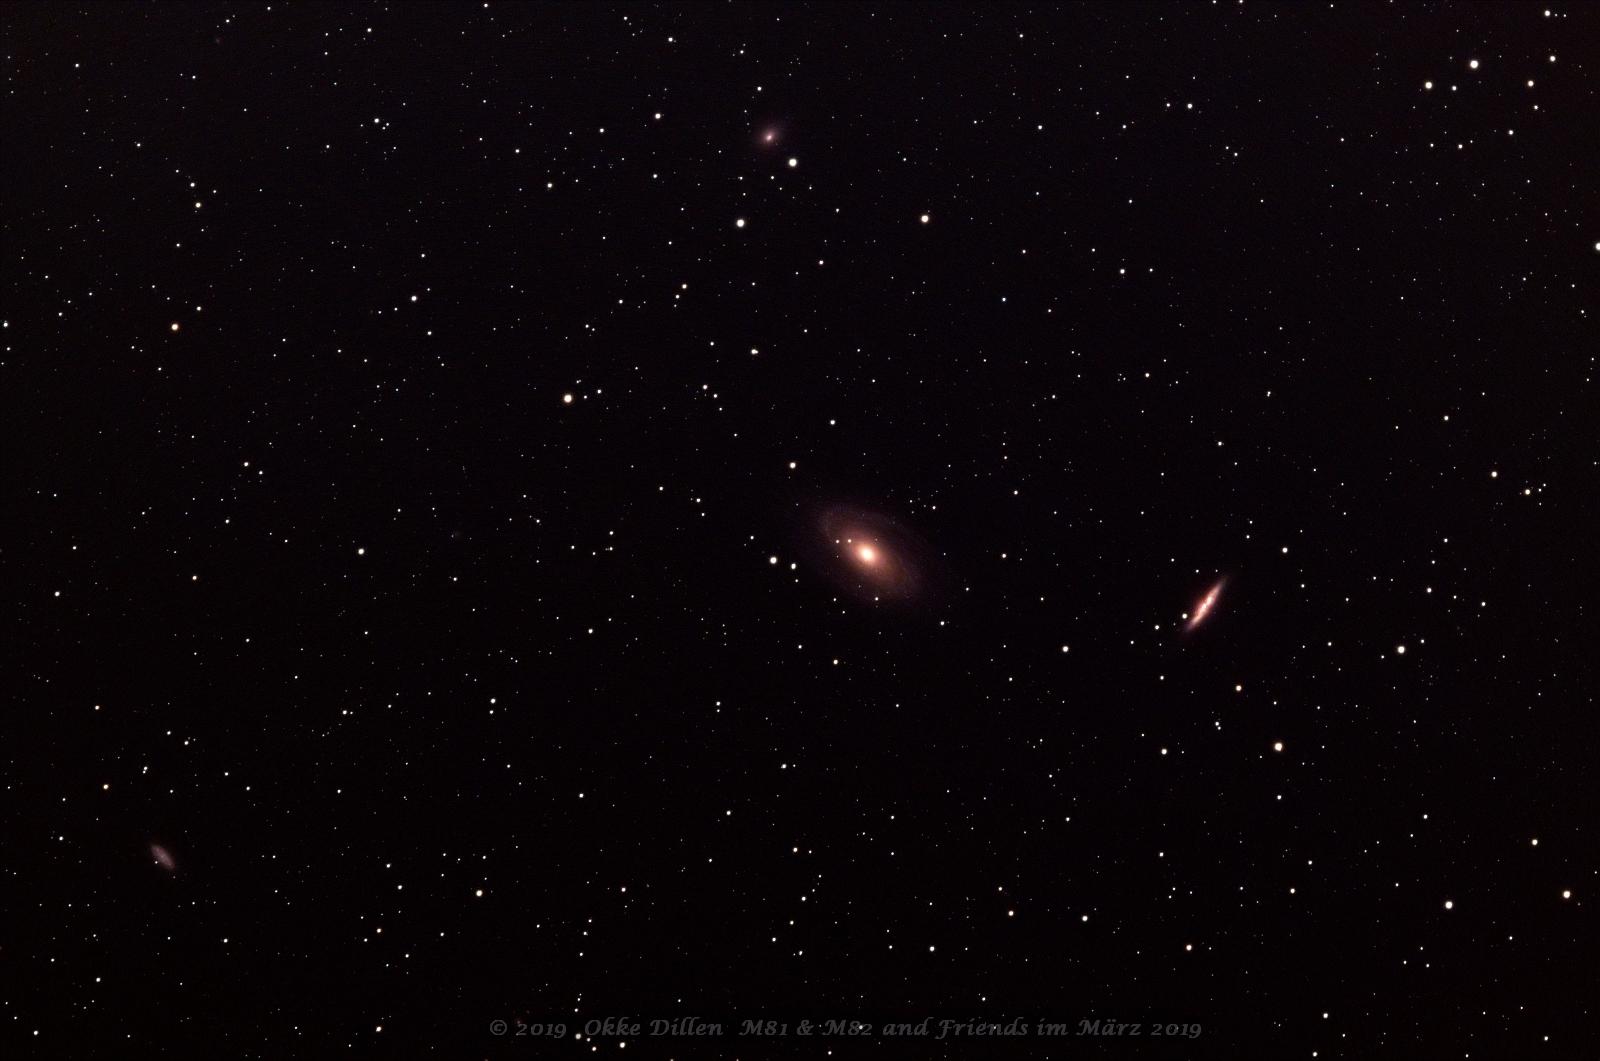 M81+M82+Friends_dss3+hs2_ps2_1600_neat_ps_p2_2nd_fc.jpg